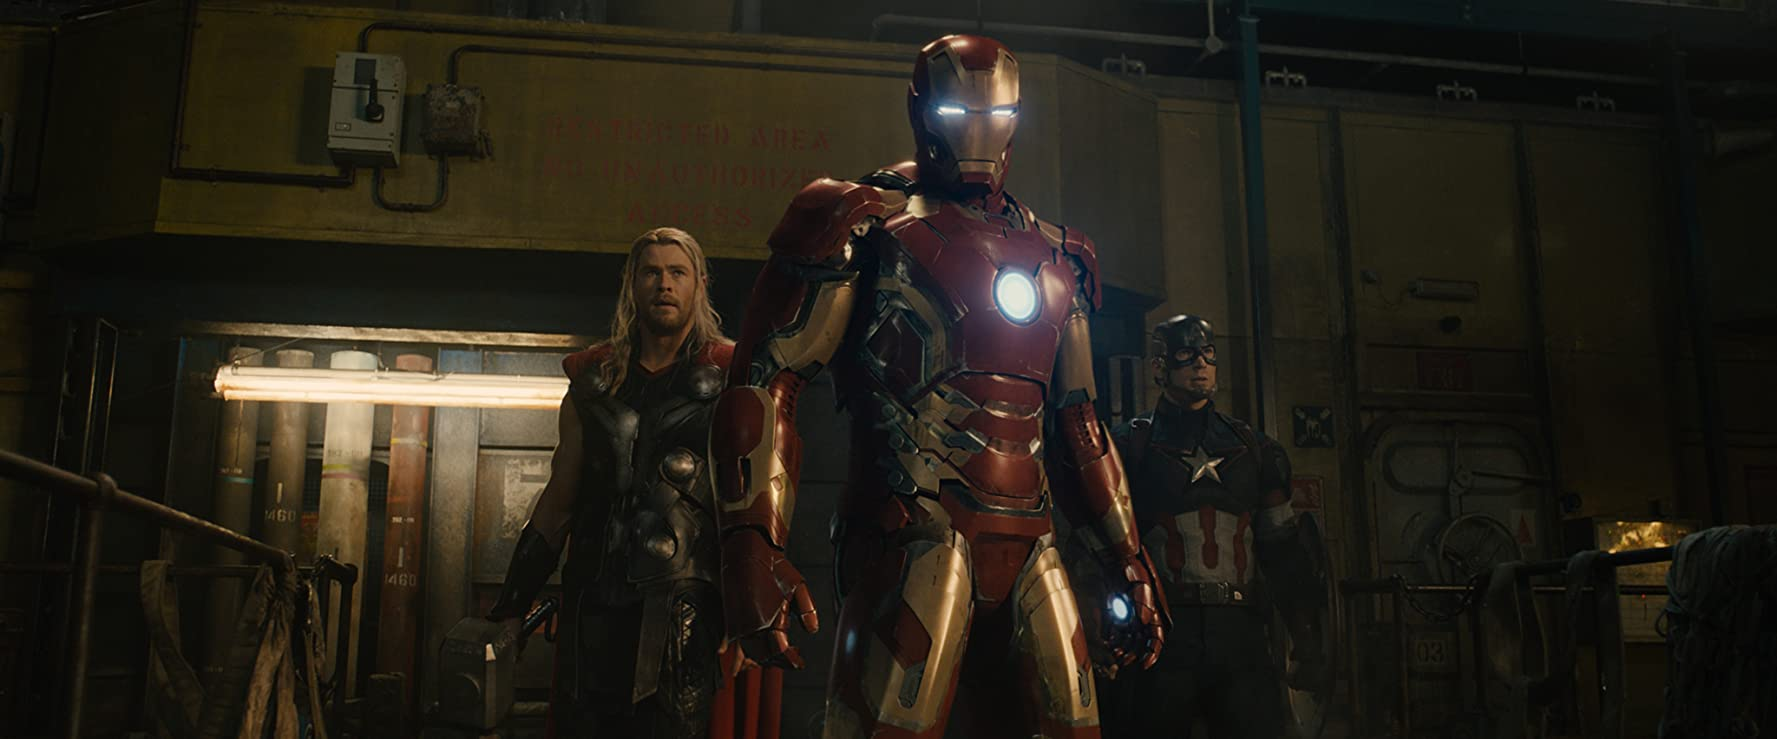 Robert Downey Jr., Chris Evans, and Chris Hemsworth in Avengers: Age of Ultron (2015)